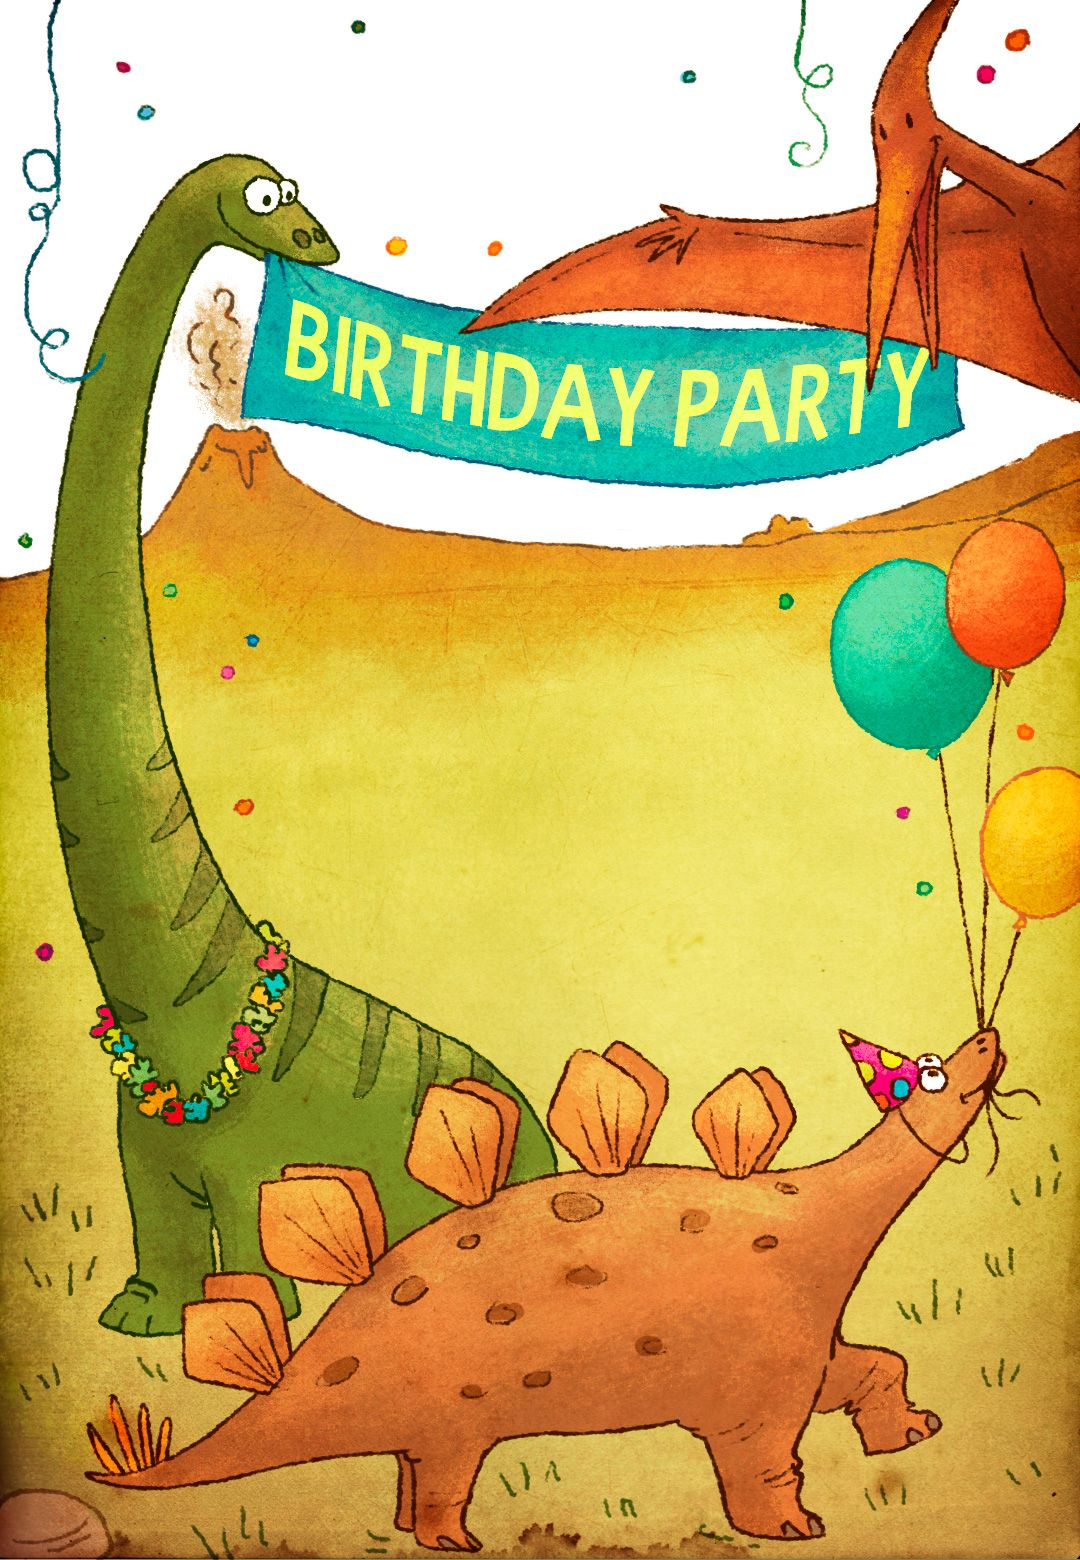 Dinosaurs Birthday Party - Free Printable Birthday Invitation ...